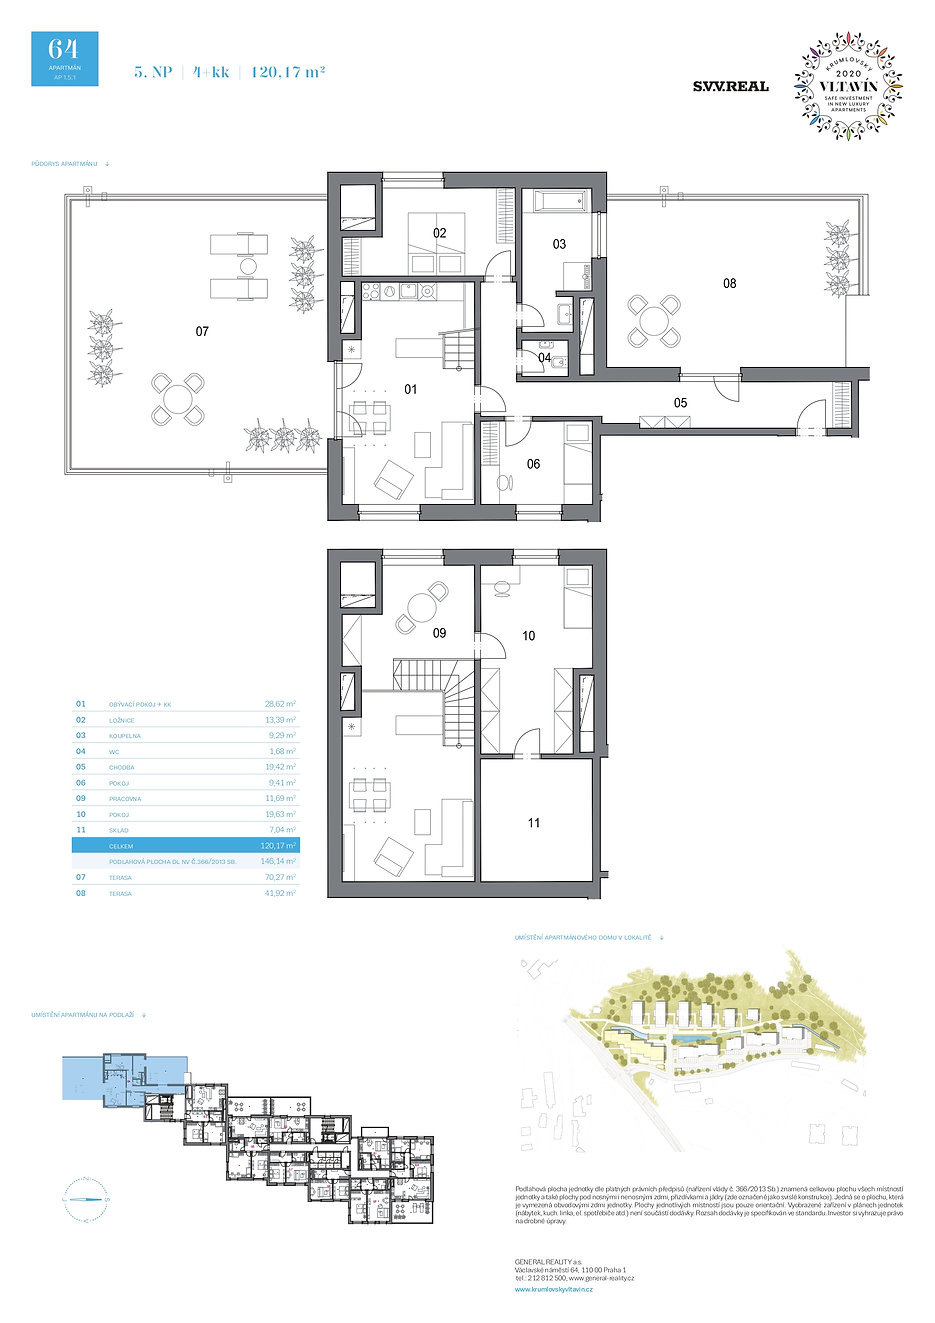 GR_krumlovsky-vltavin_bytove-karty-apartmany_5NP_A64_page-0001.jpg